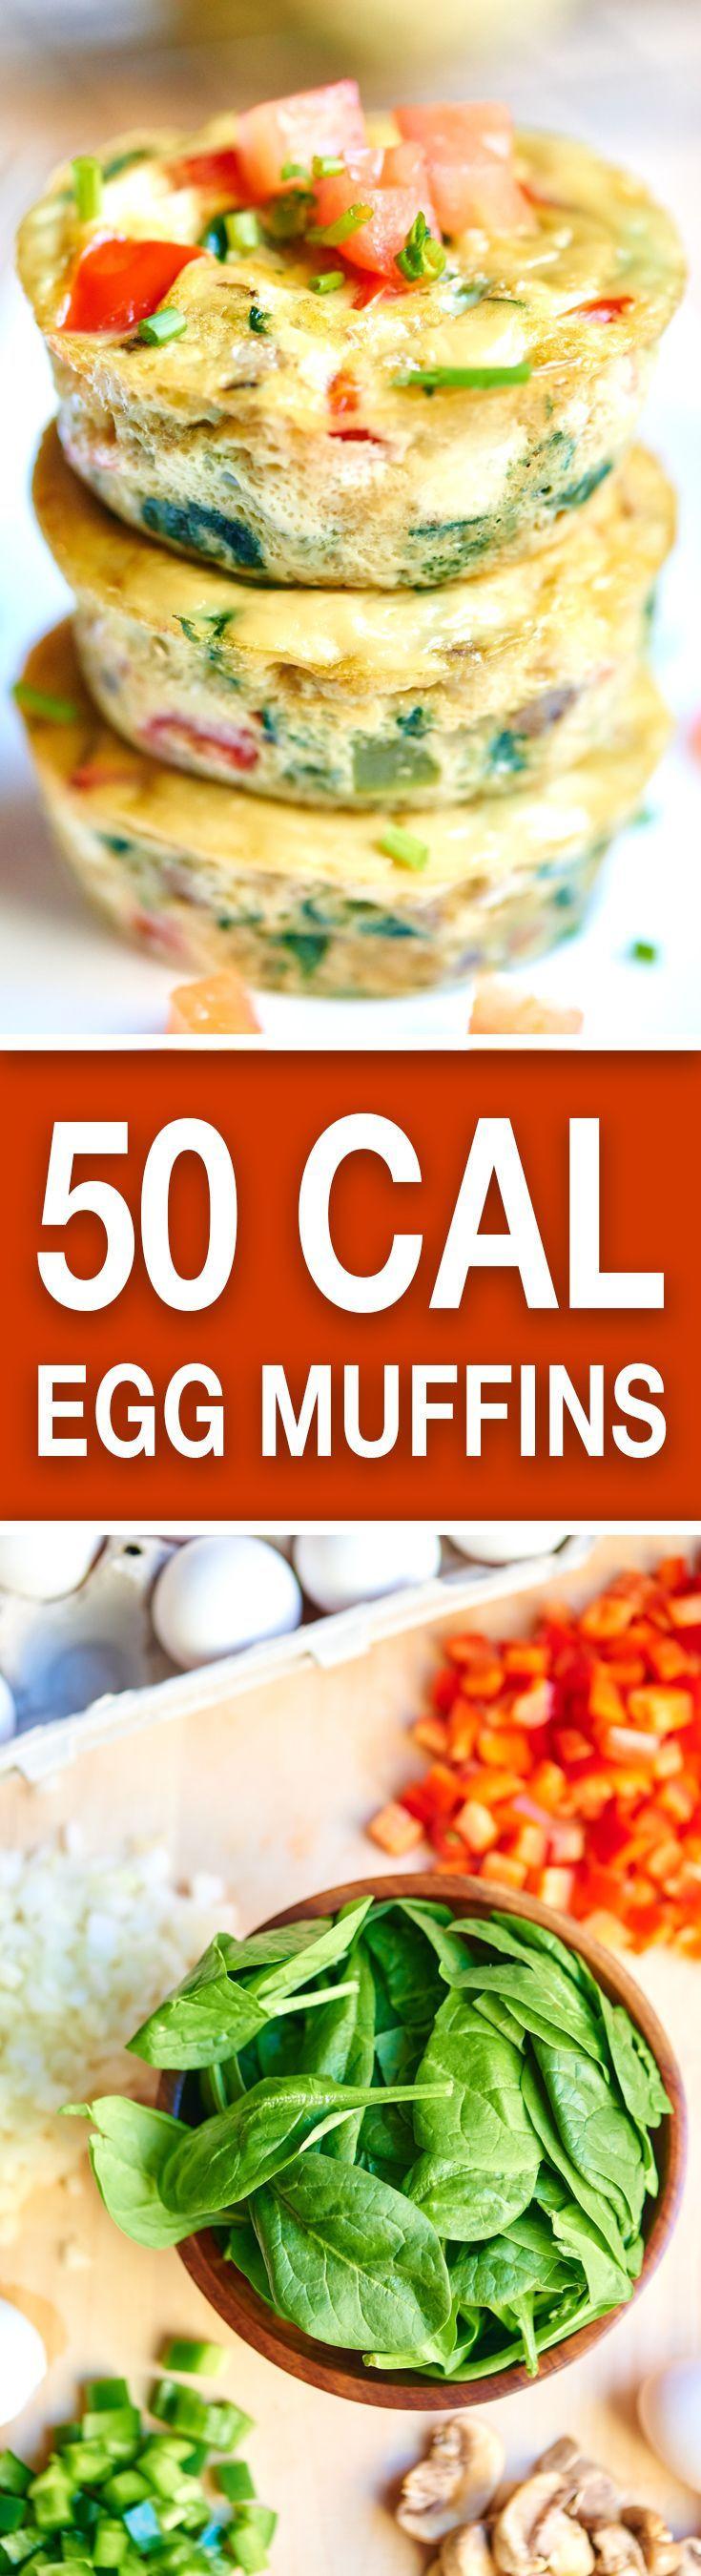 Healthy Breakfast Muffins Low Calorie  1000 ideas about Low Calorie Breakfast on Pinterest